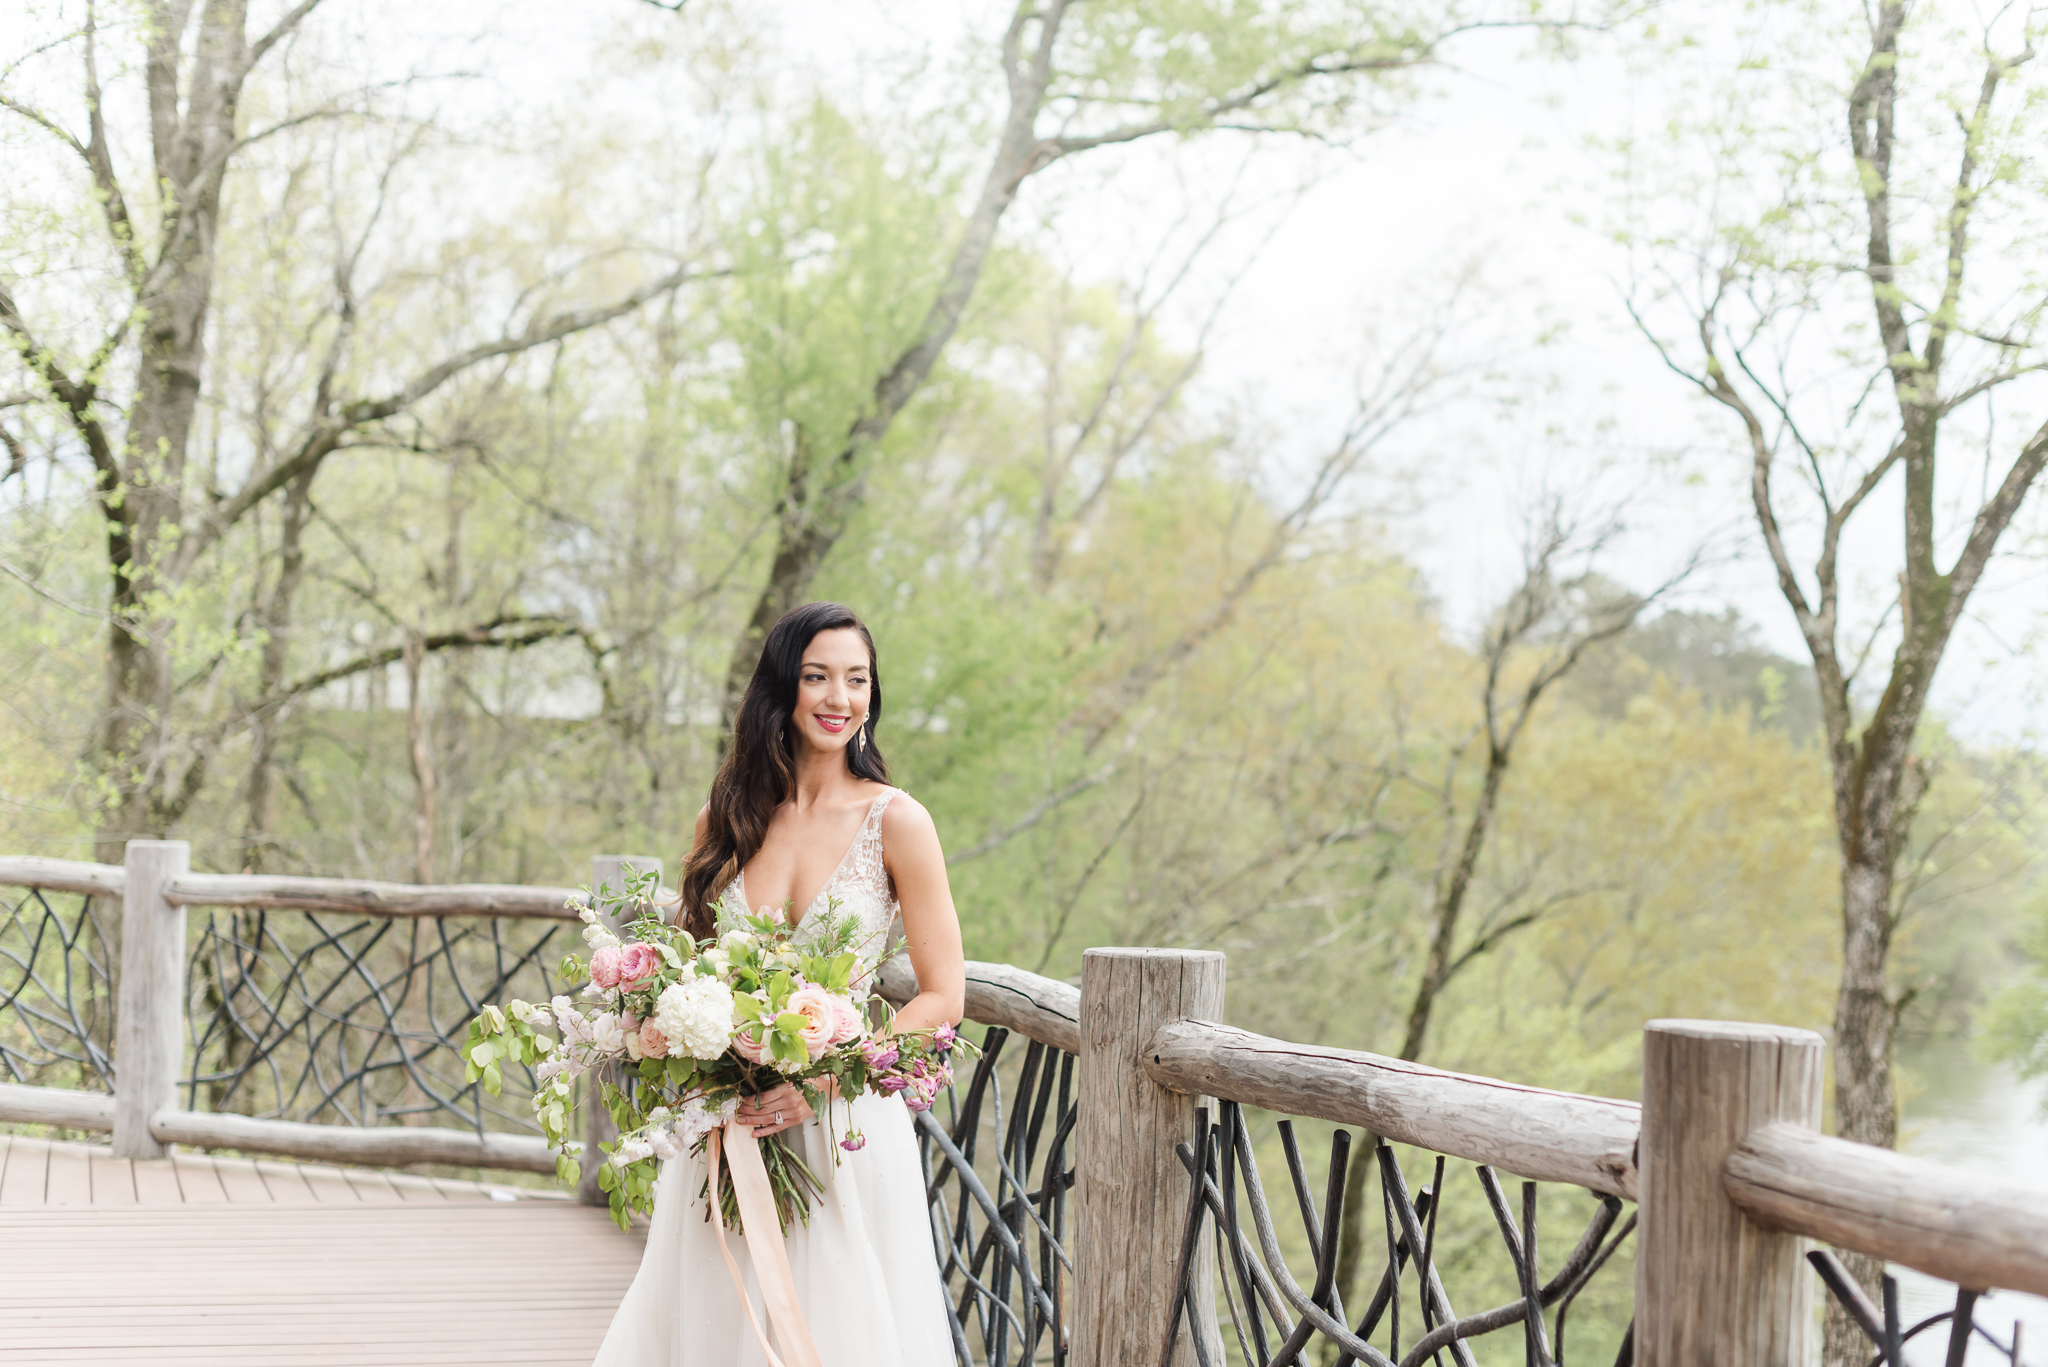 Wedding Day Bridal Portraits on the River-21.jpg